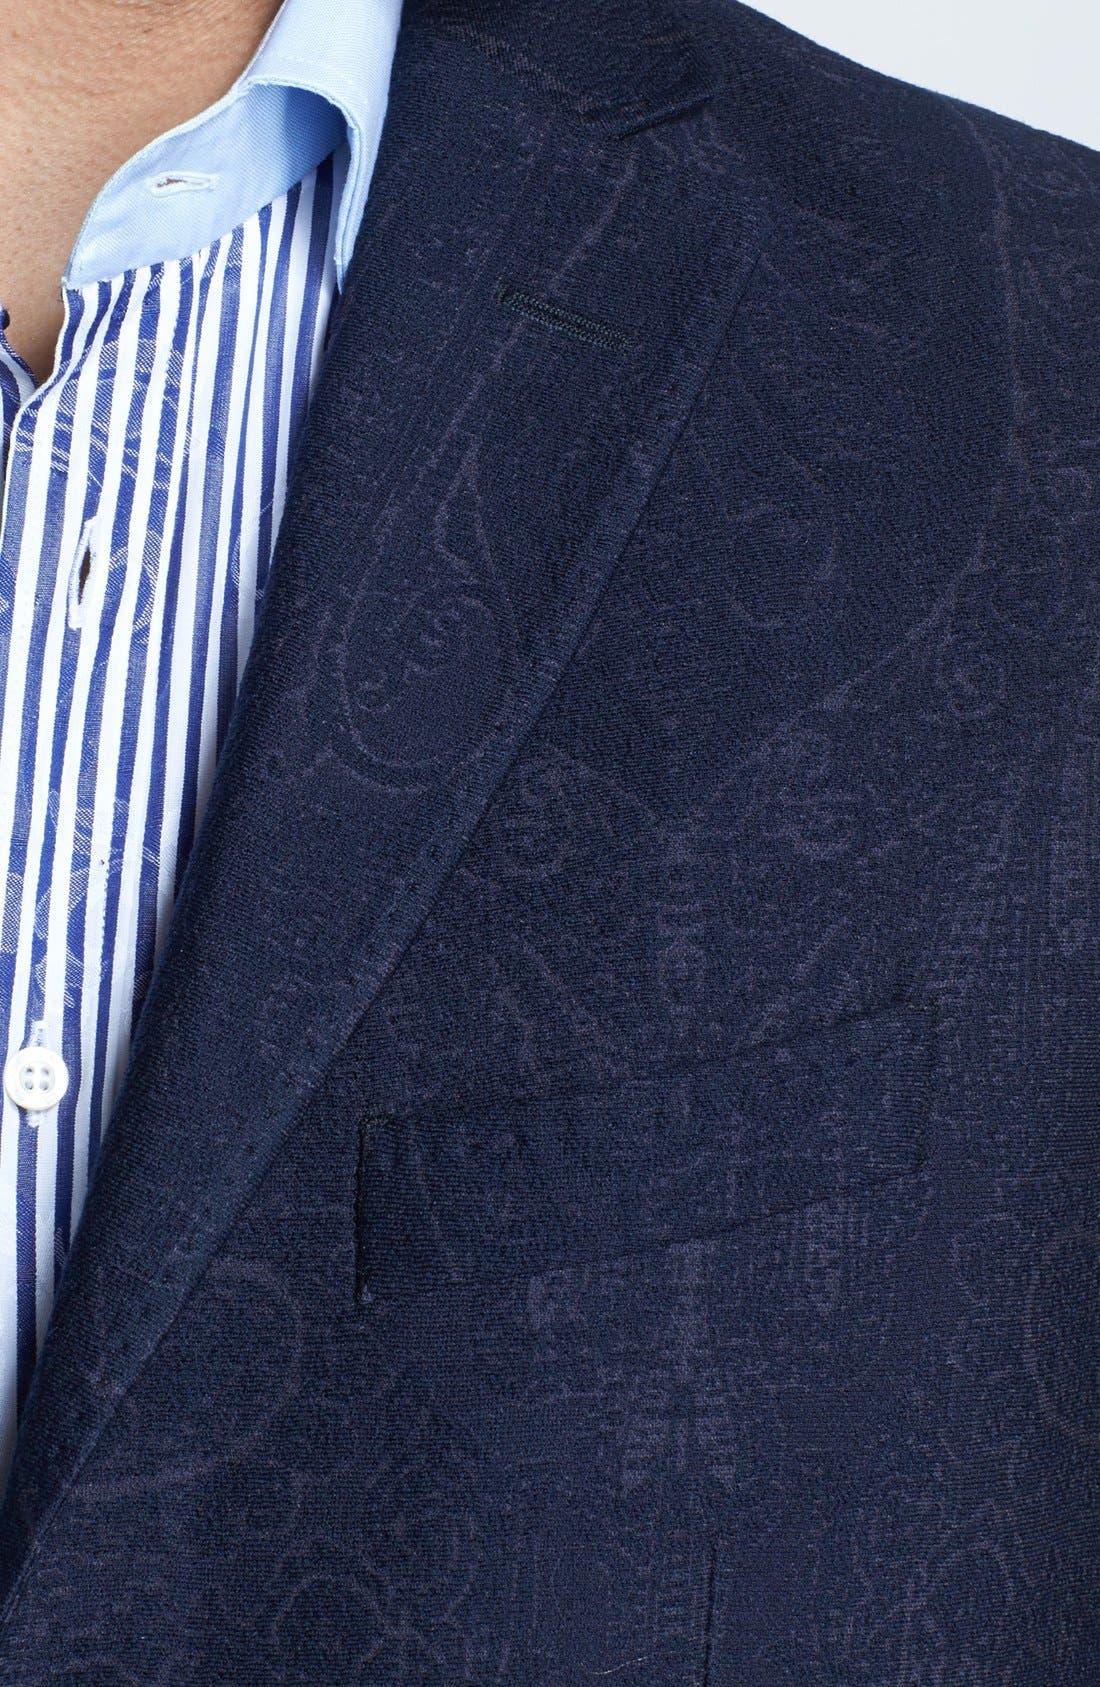 Alternate Image 3  - Etro Tonal Paisley Sportcoat